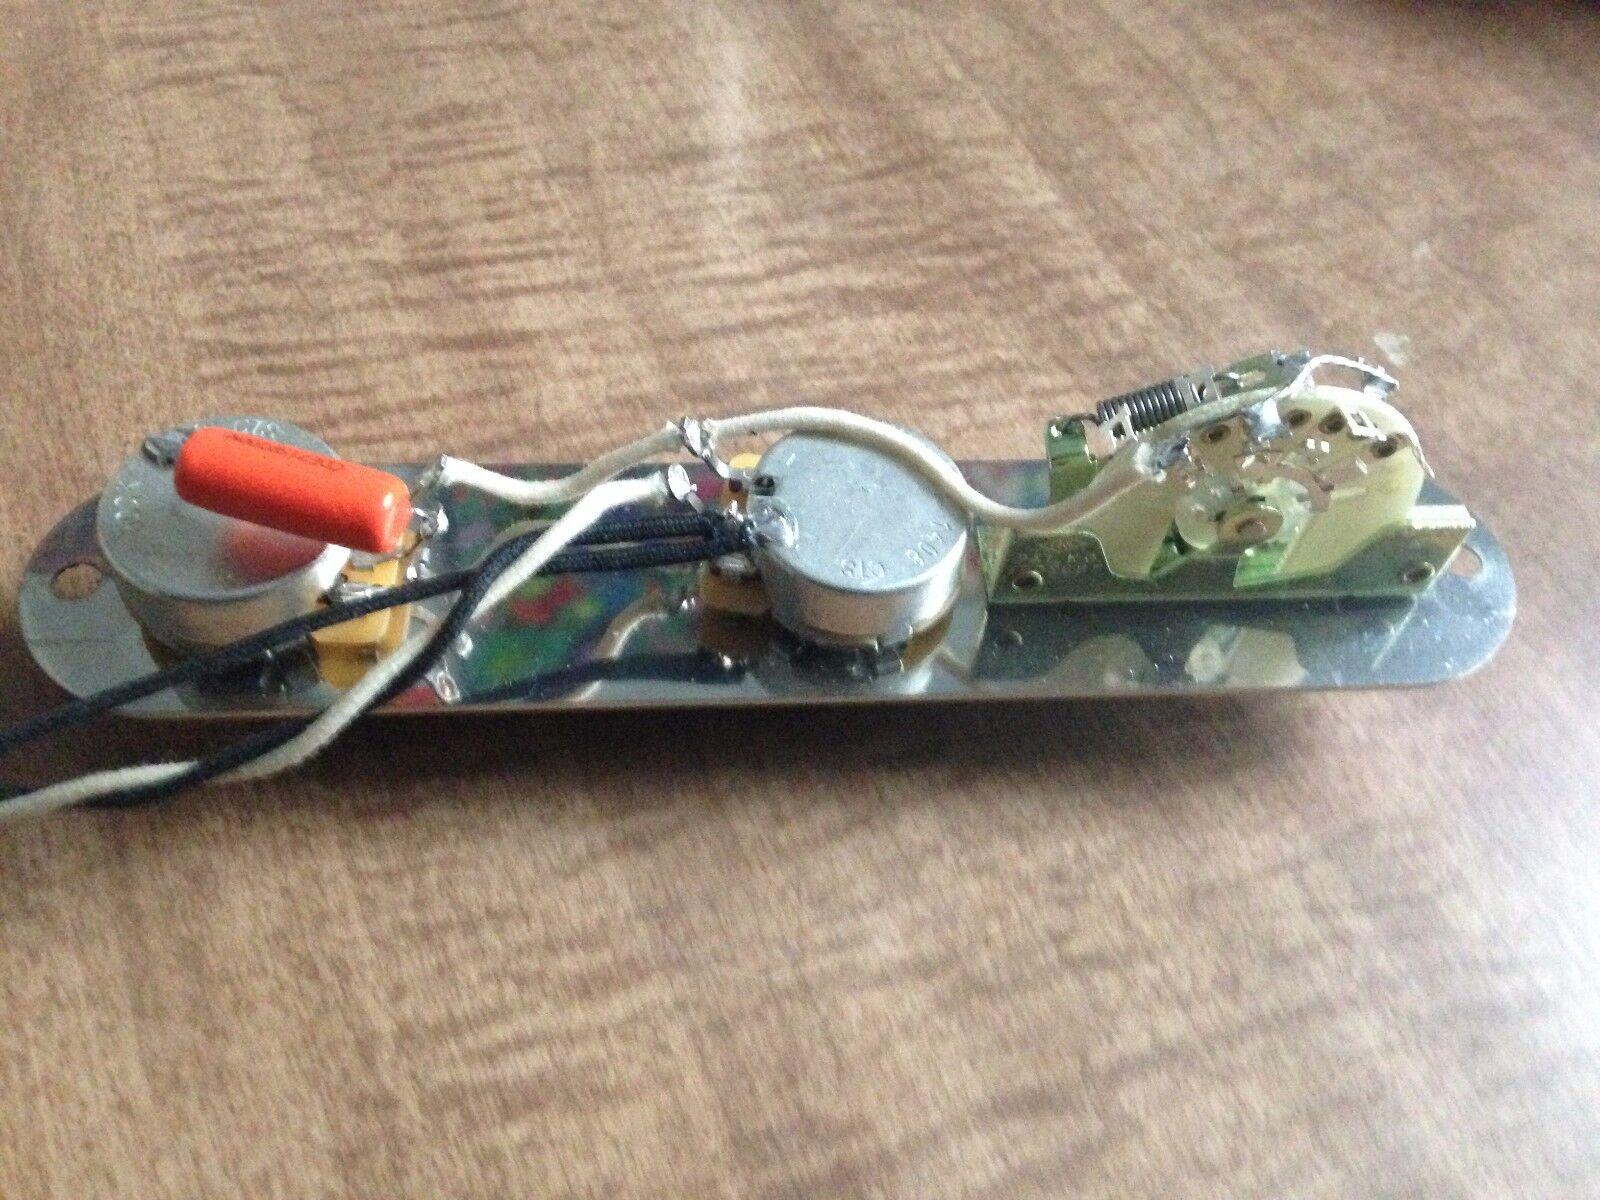 hight resolution of fender telecaster wiring harness 500k pots cap switch input jack knobs tele for sale online ebay